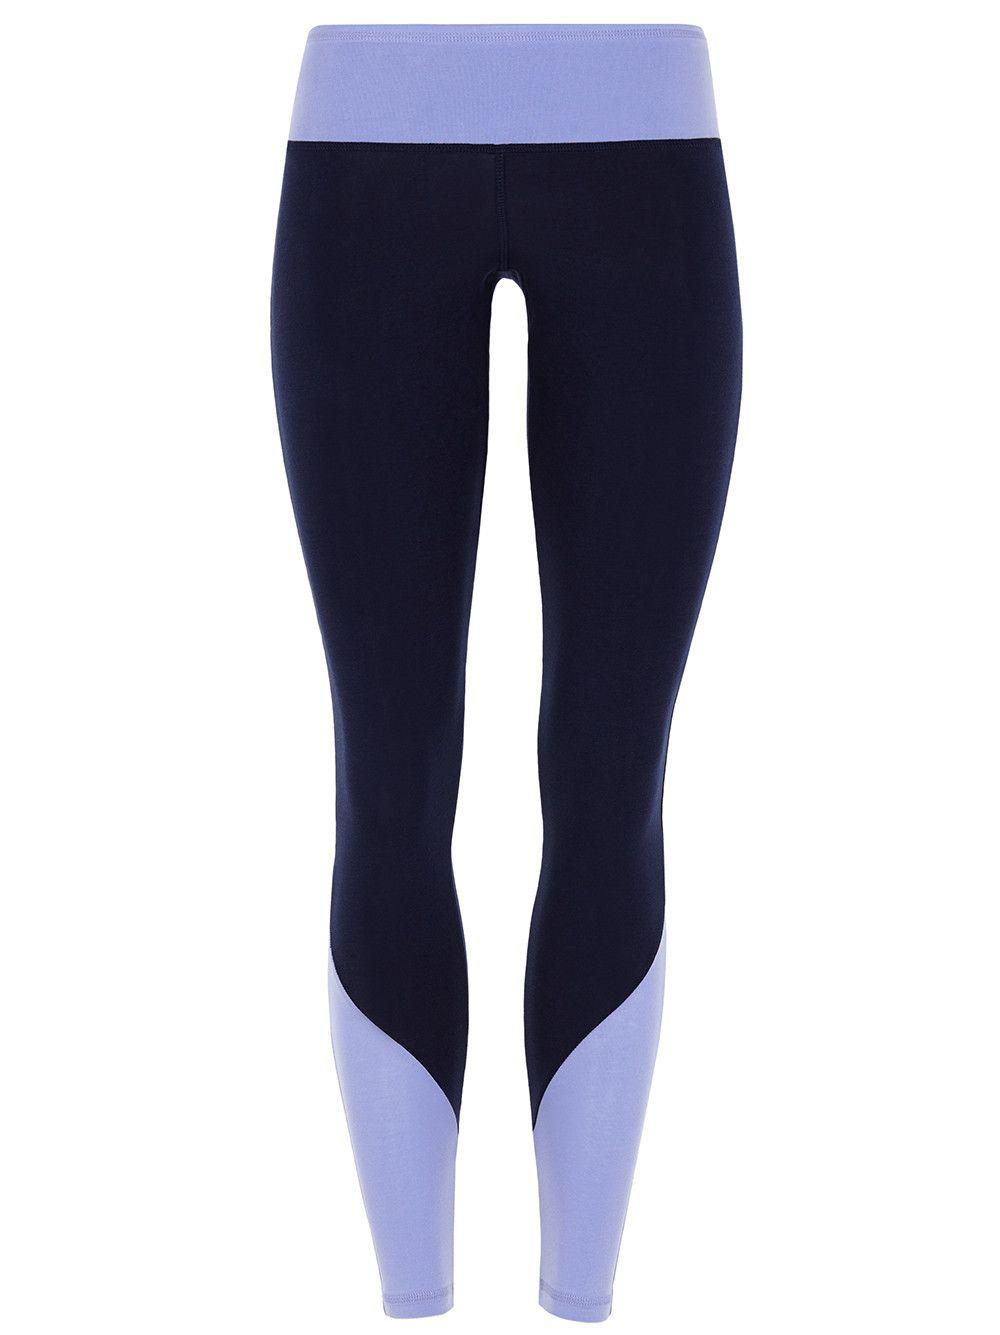 Colour Block Legging - navy